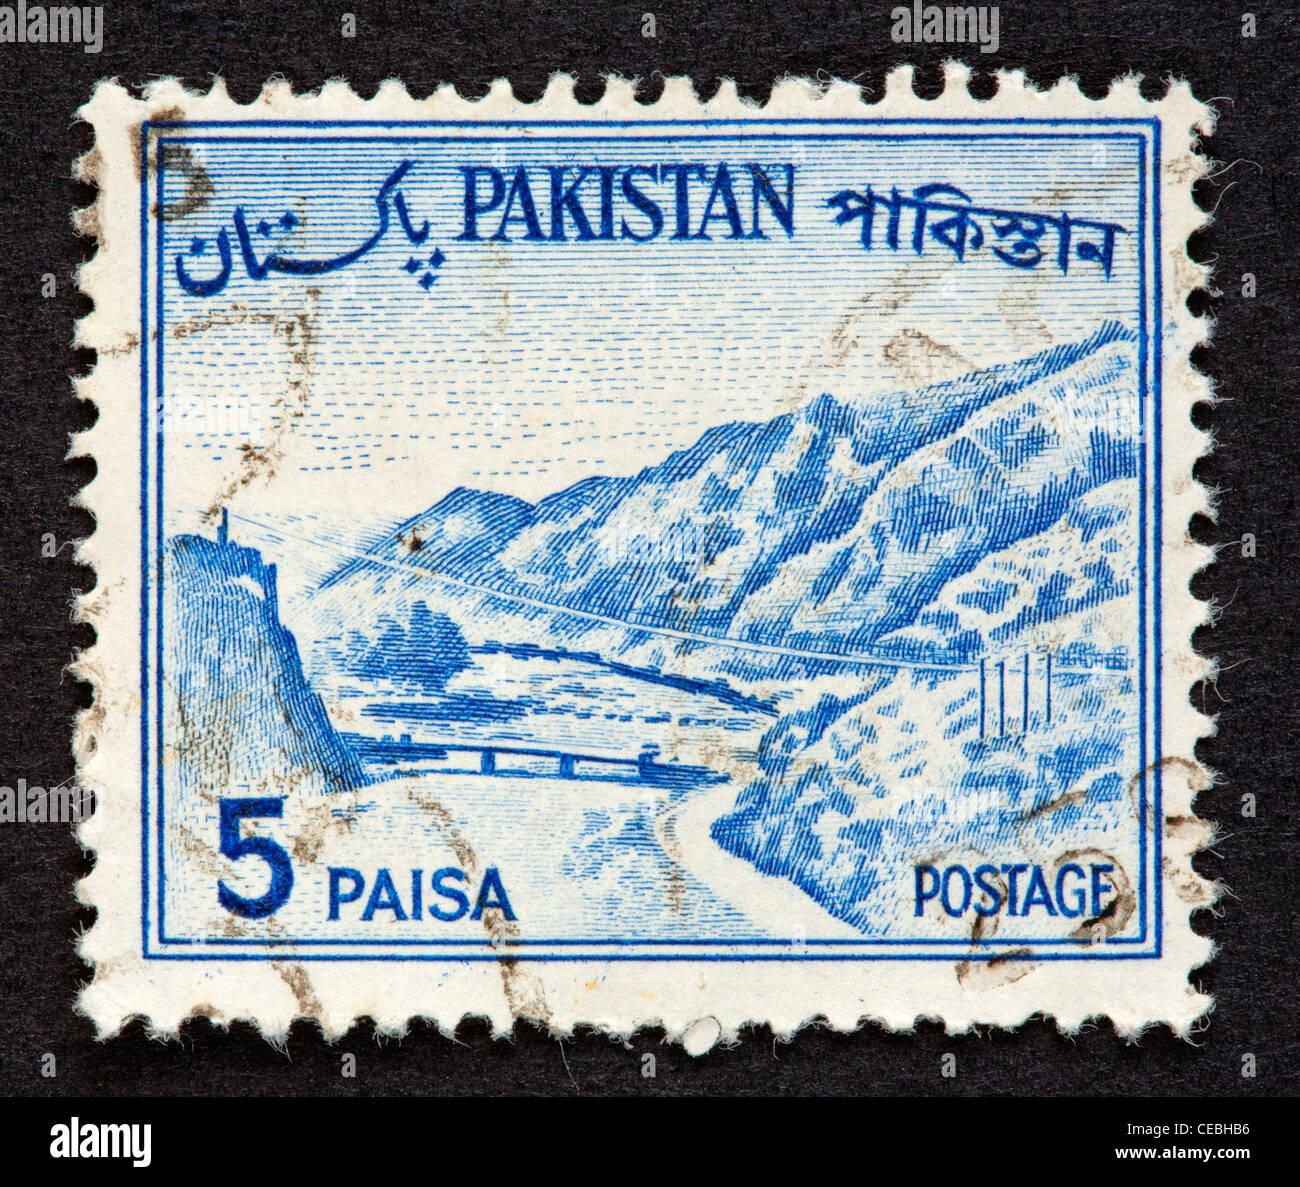 Pakistanische Briefmarke Stockbild